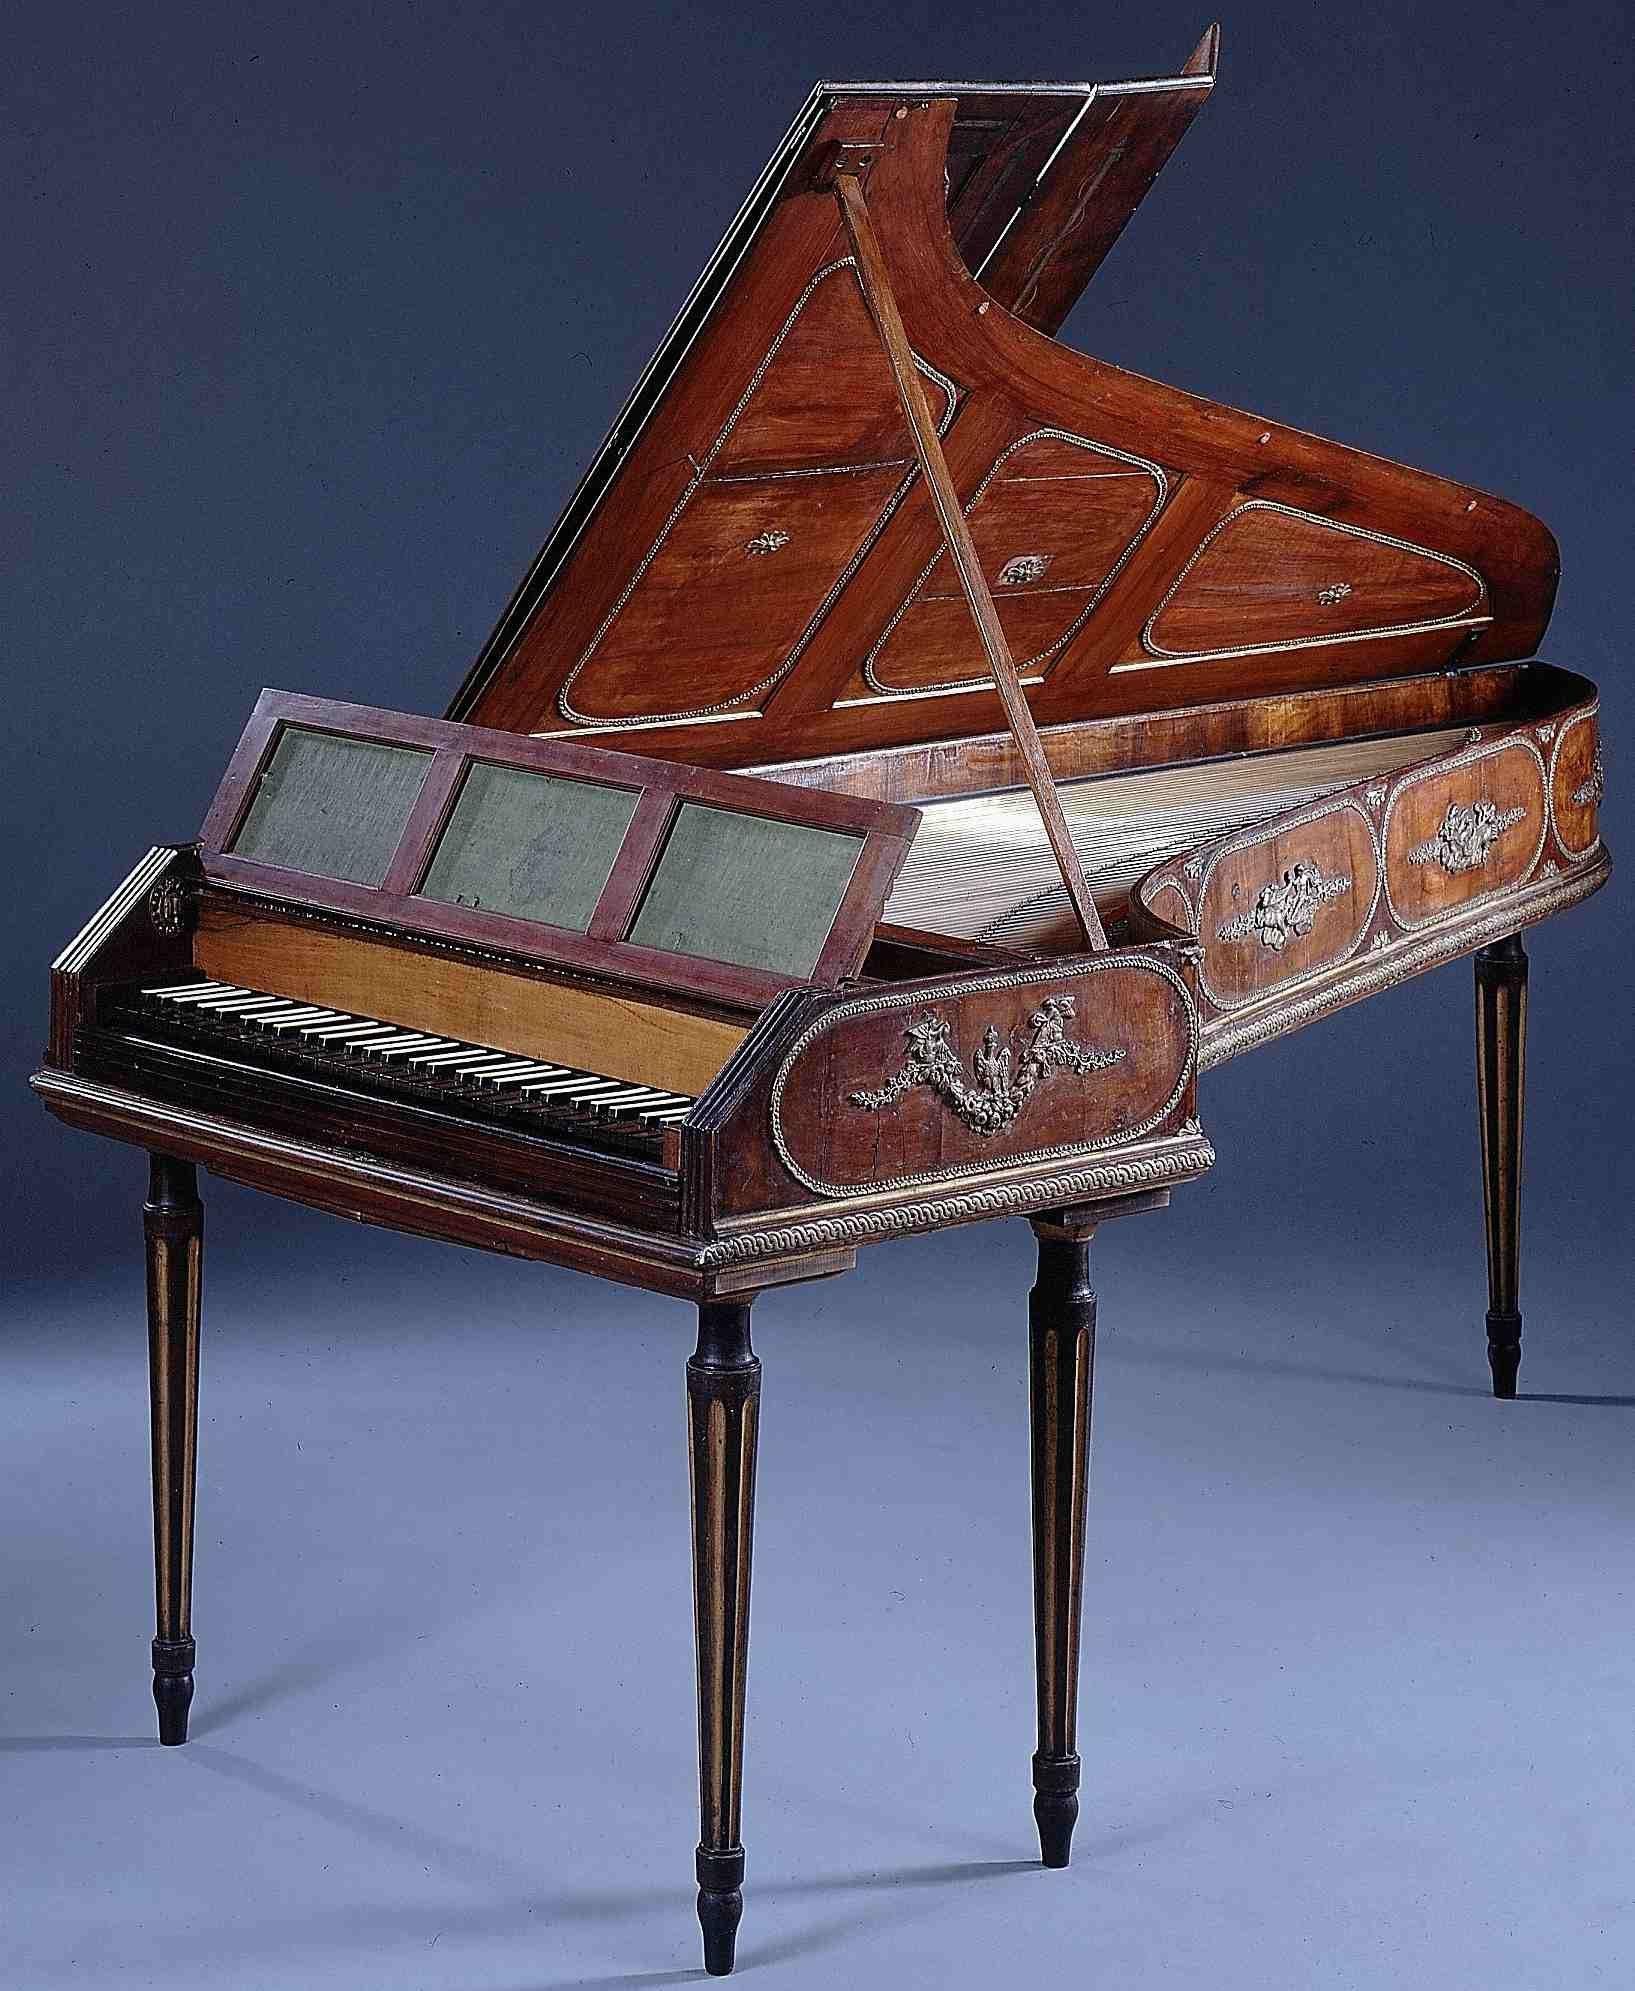 18th-century fortepiano.